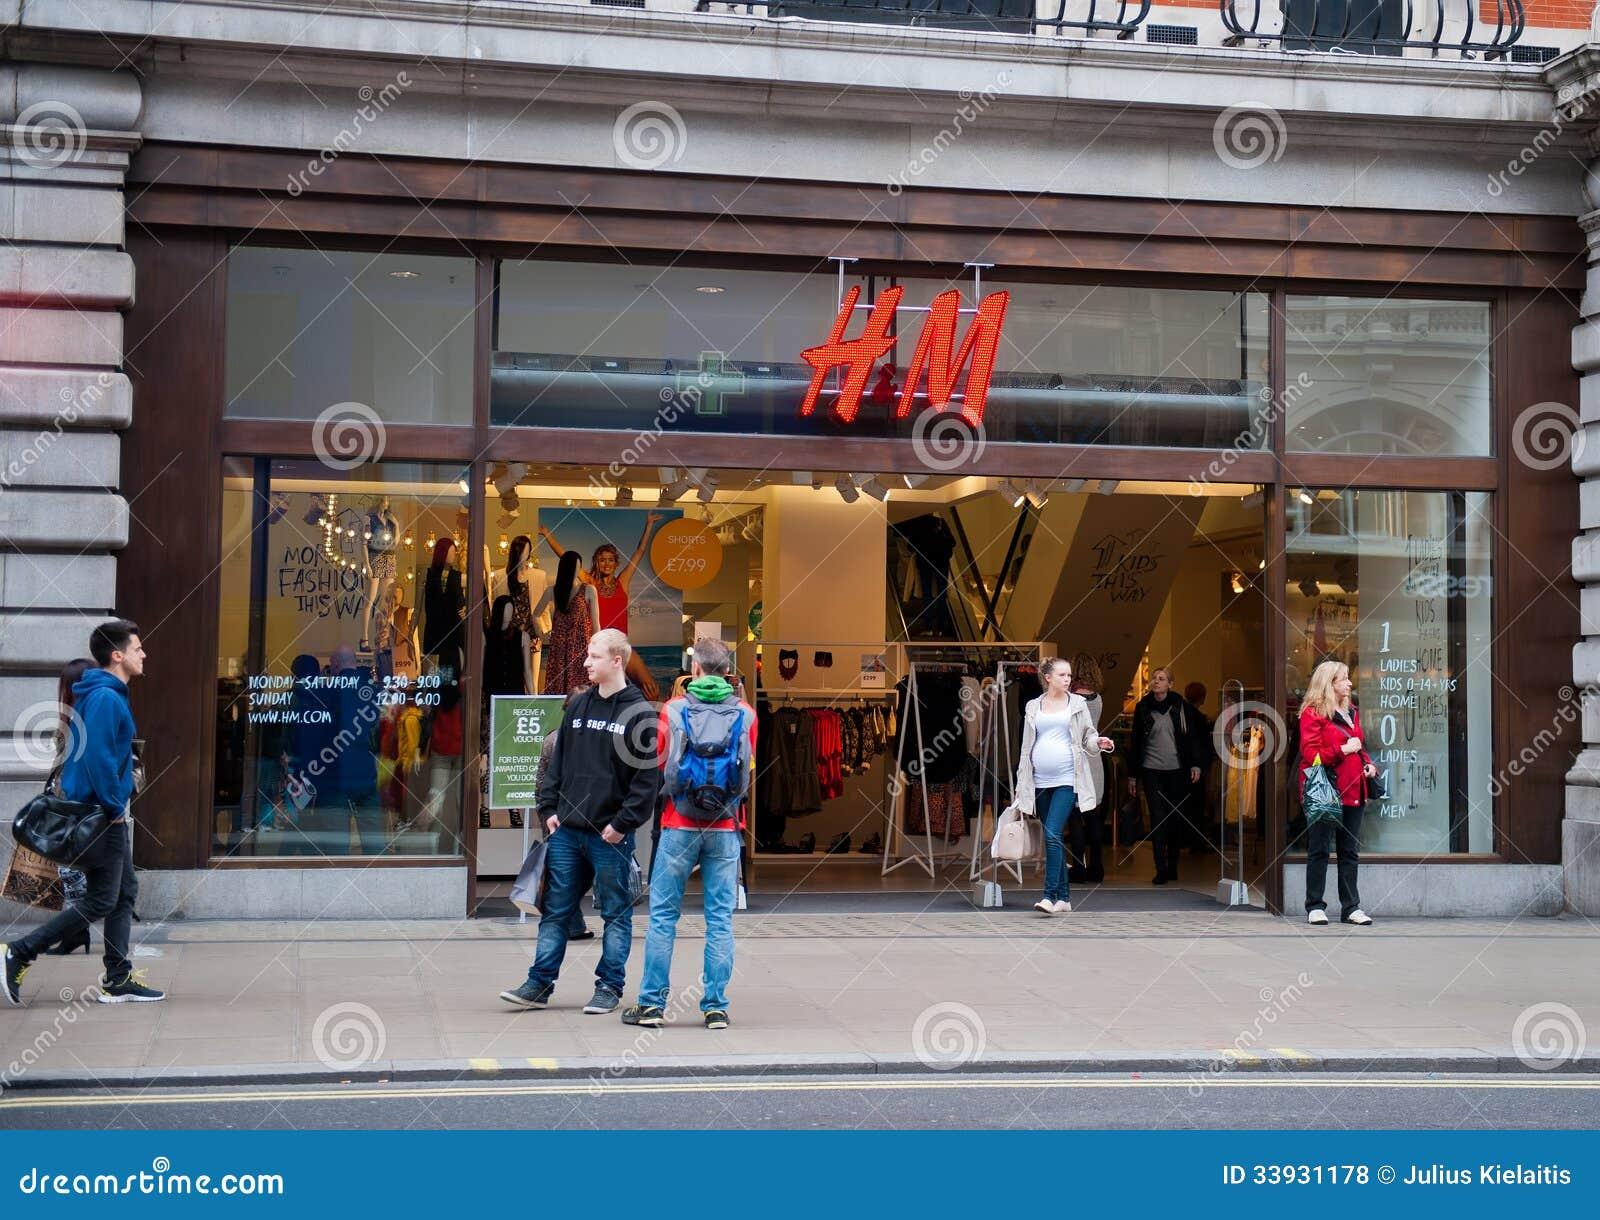 EDIT-018-0009_Stella_McCartney_and_Adidas_Brompton_Store_Clothes_Shop_Europe_United_Kingdom__2012_APA_London_Store.jpg